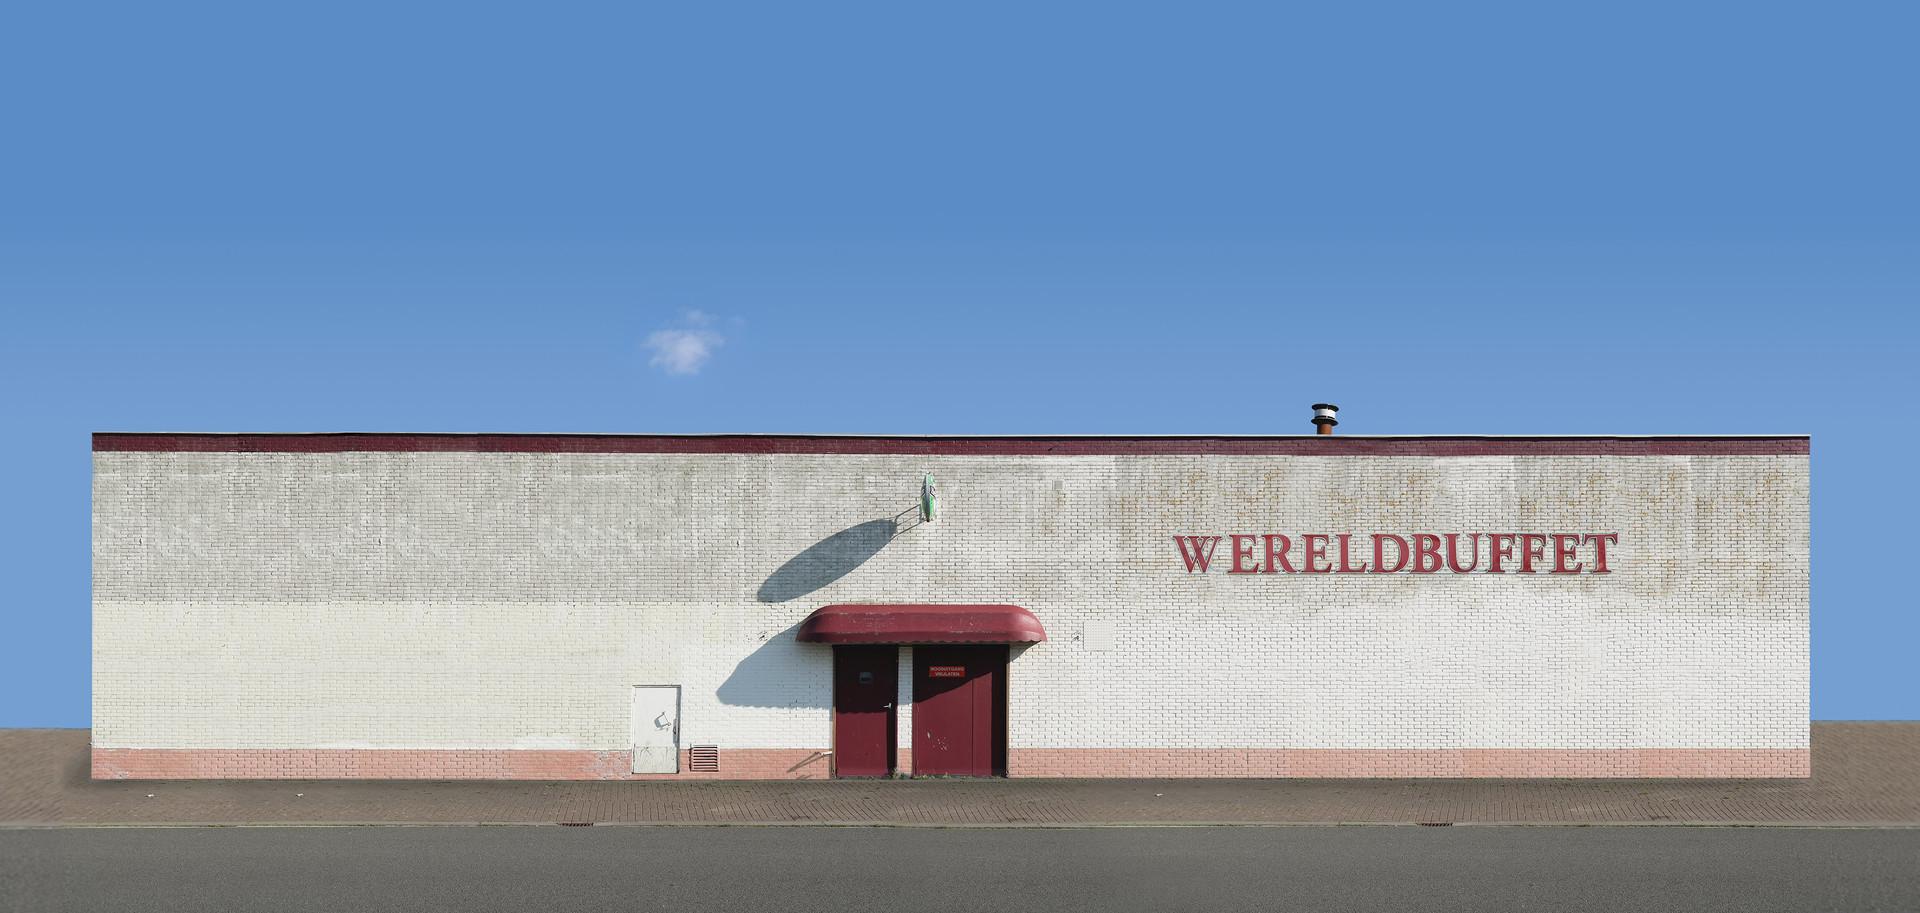 Wereldbuffet